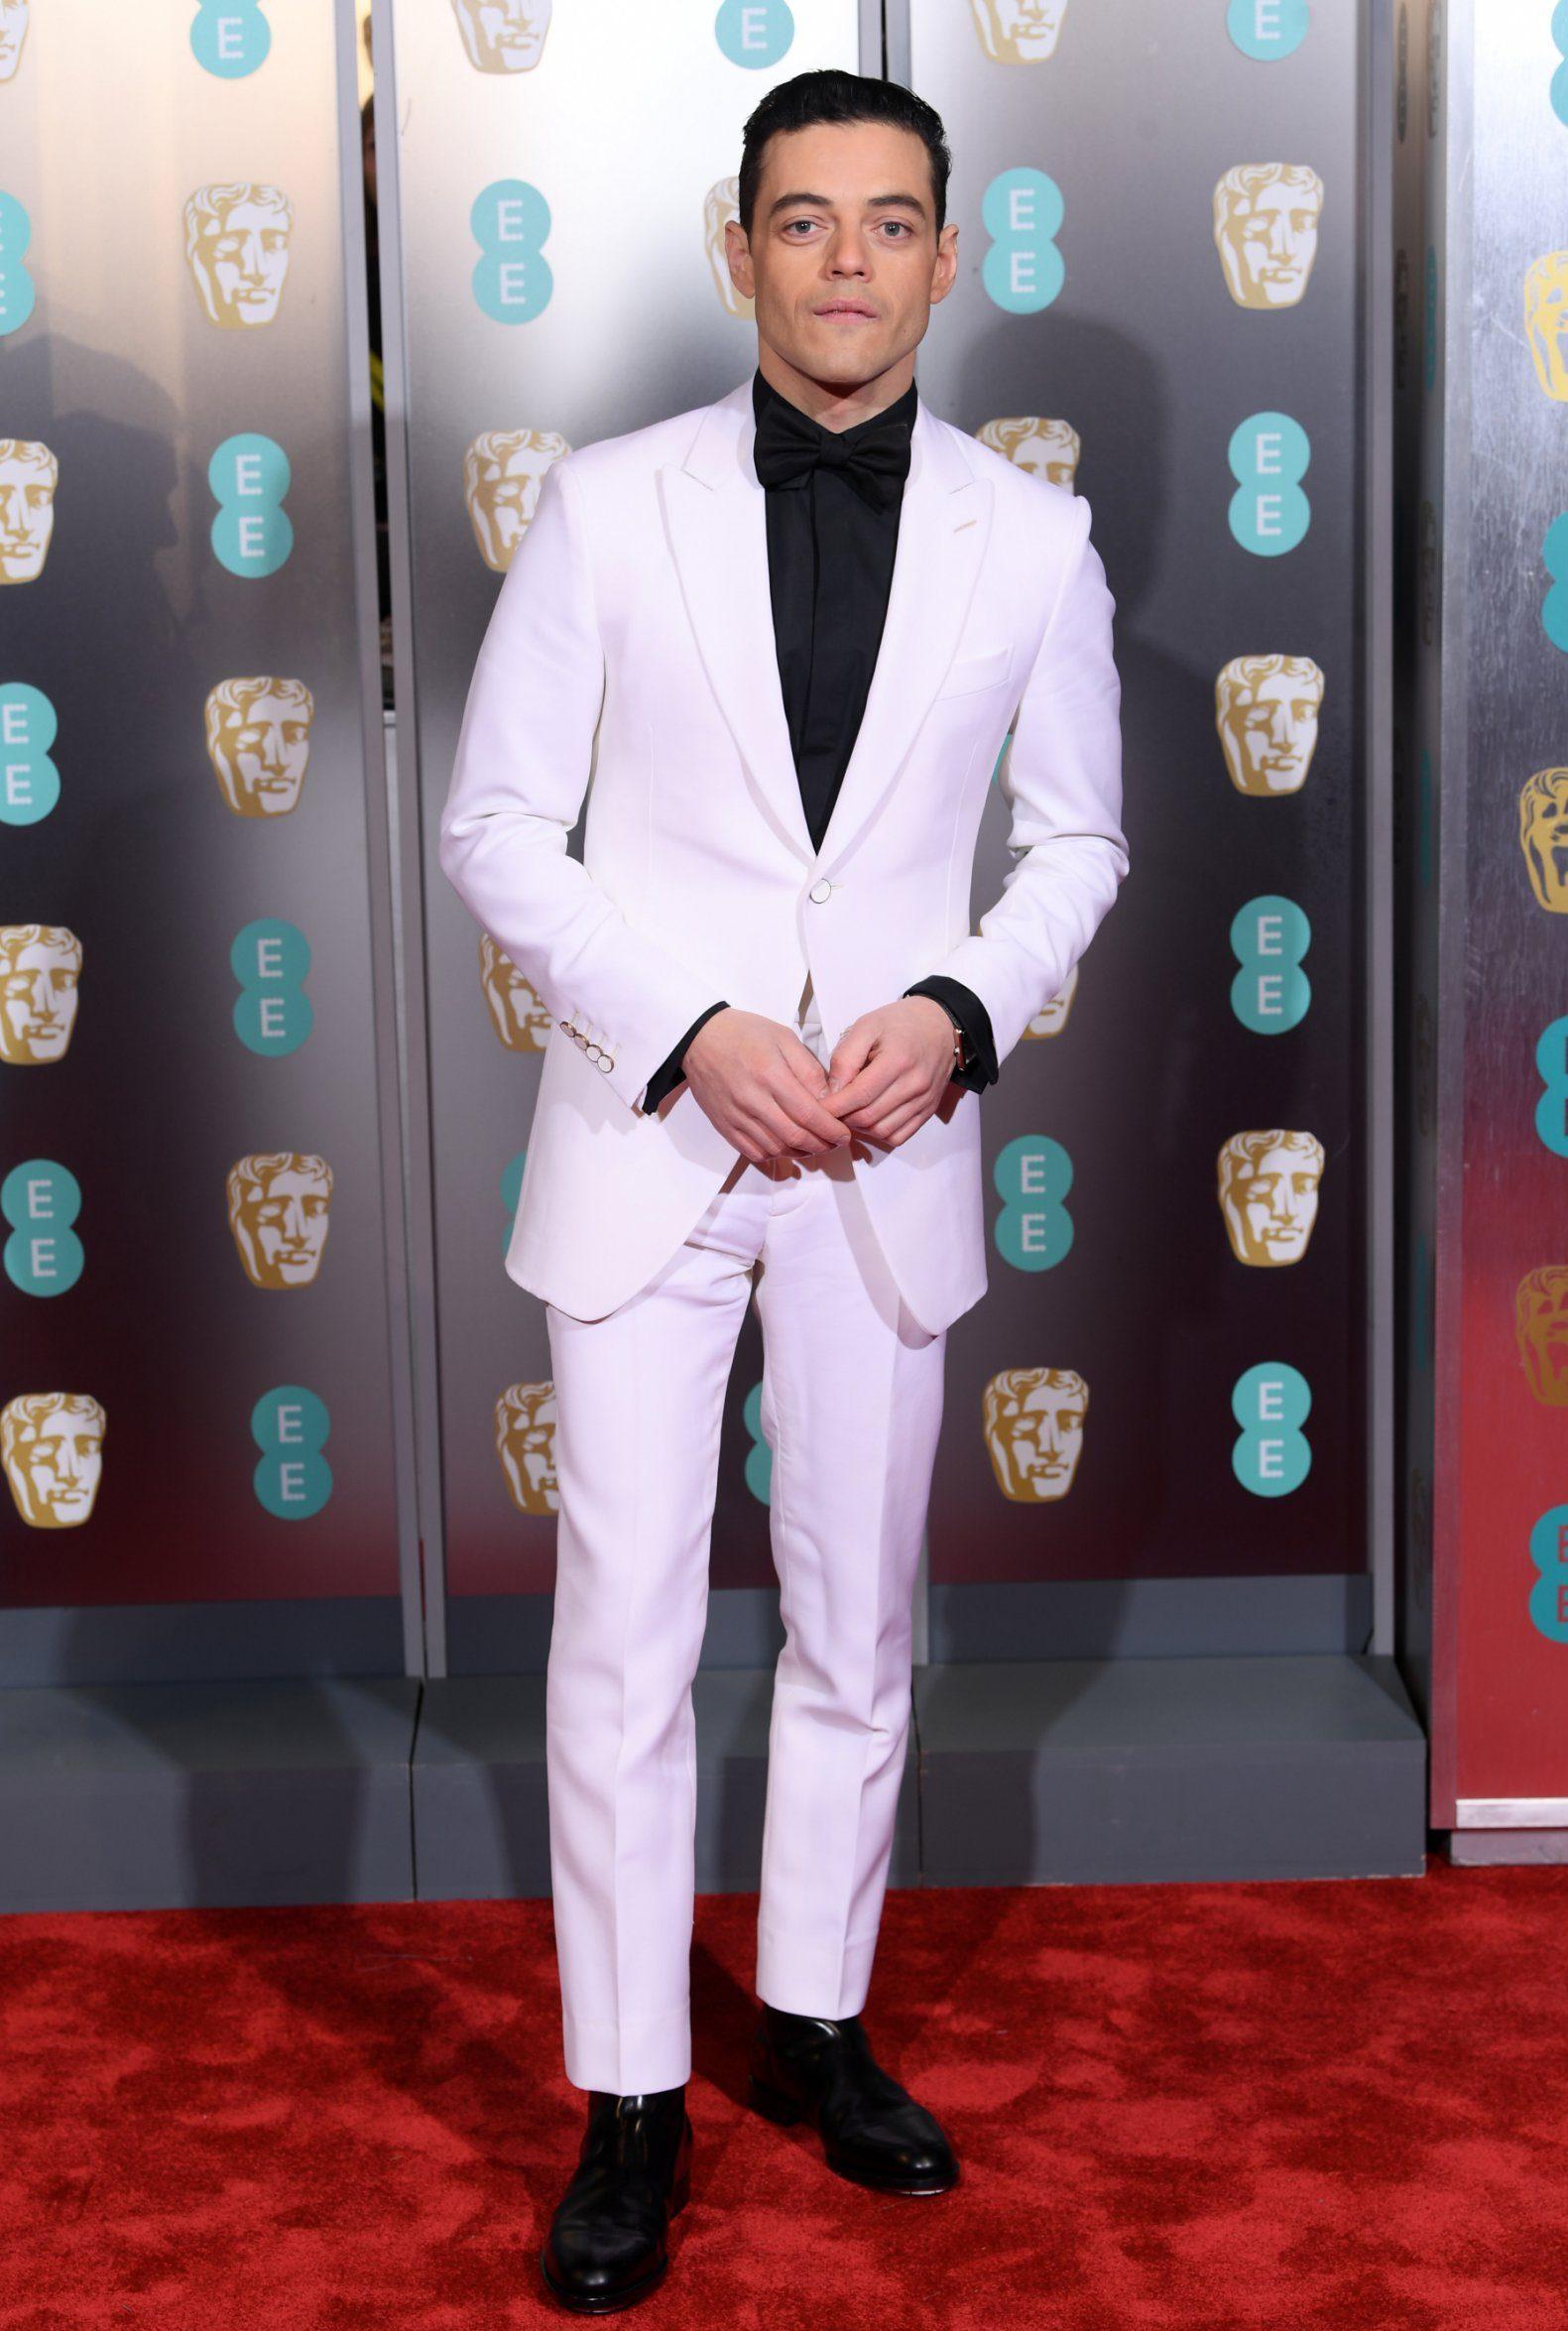 Mandatory Credit: Photo by David Fisher/BAFTA/REX (10082374ik) Rami Malek 72nd British Academy Film Awards, Arrivals, Royal Albert Hall, London, UK - 10 Feb 2019